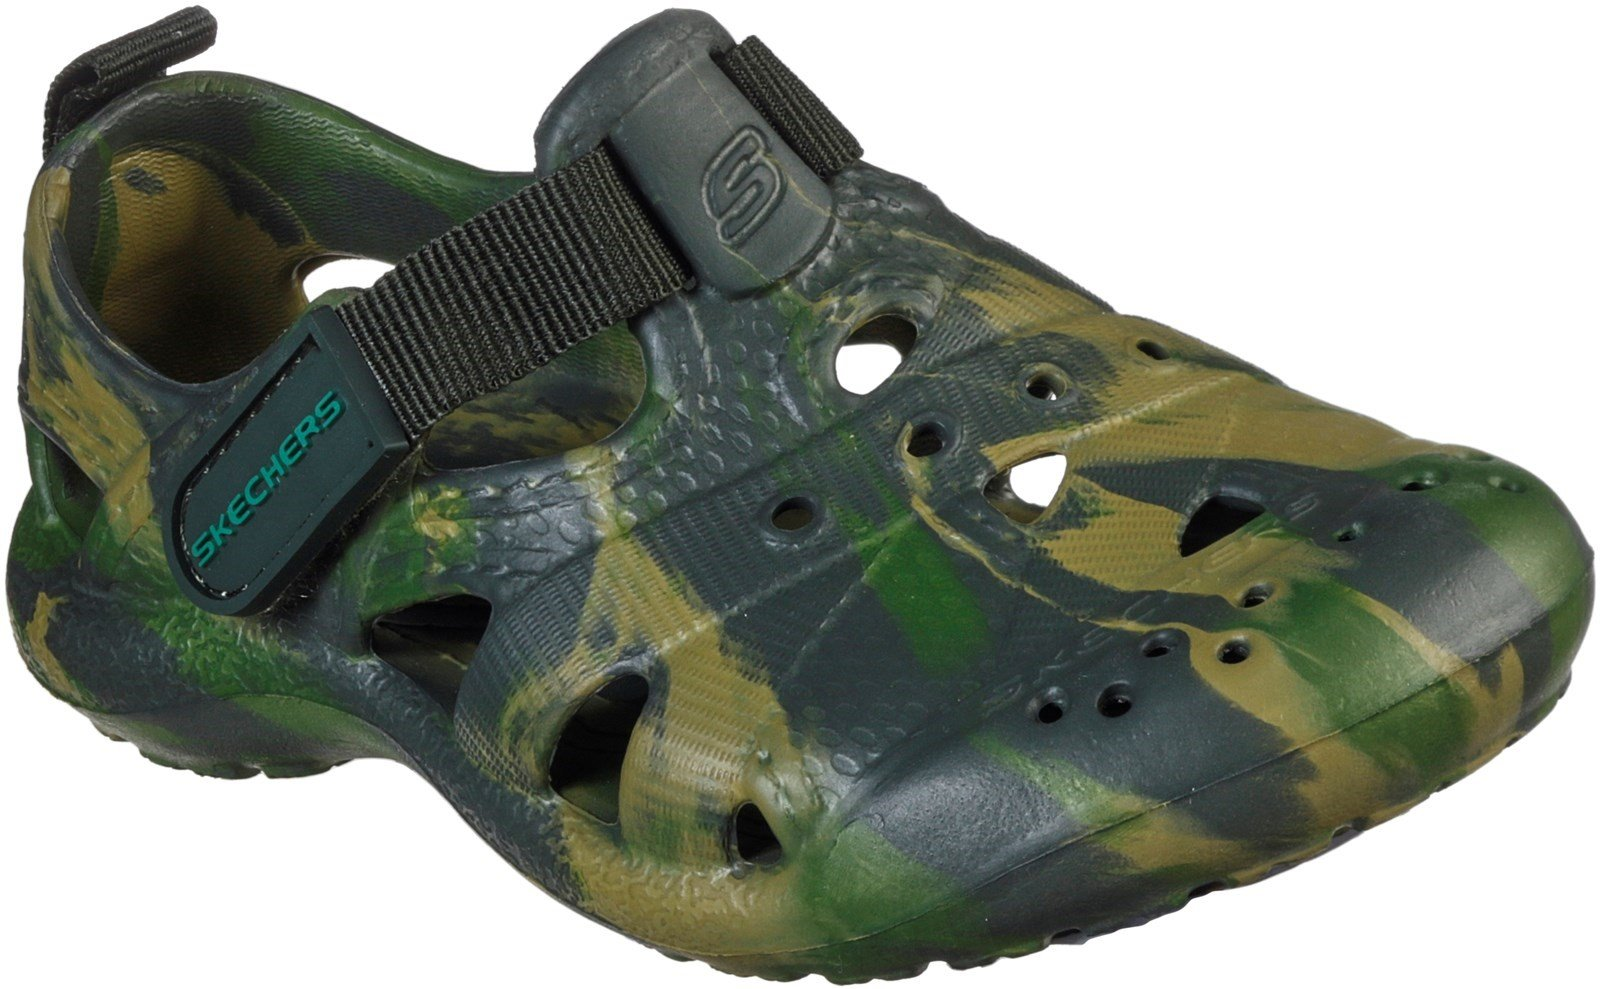 Skechers Kids Foamies Koolers Sandal Camo 30786 - Camo 4